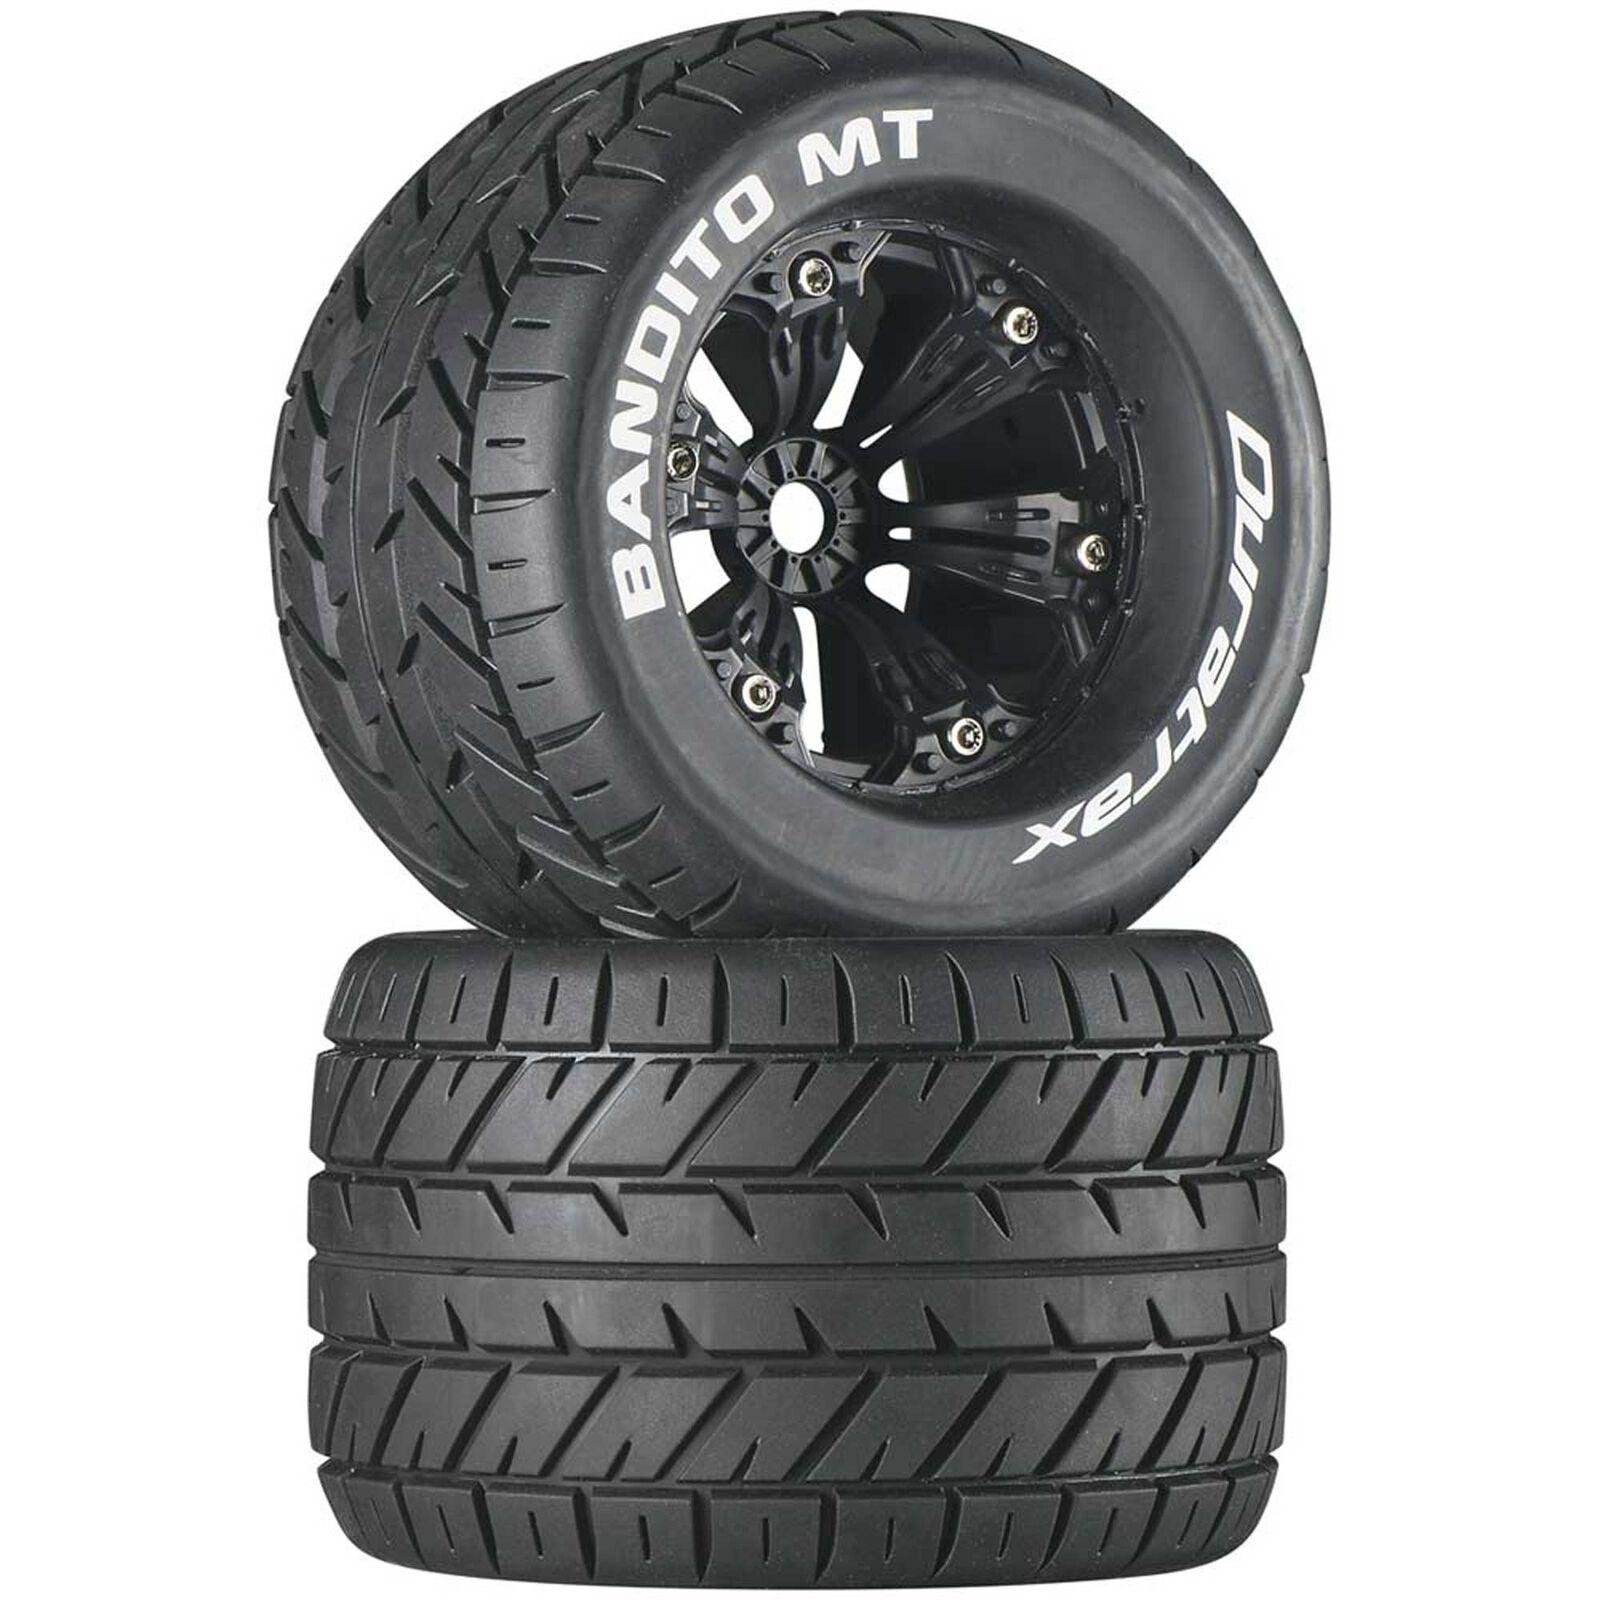 "Bandito MT 3.8"" Mounted 1/2"" Offset Tires, Black (2)"